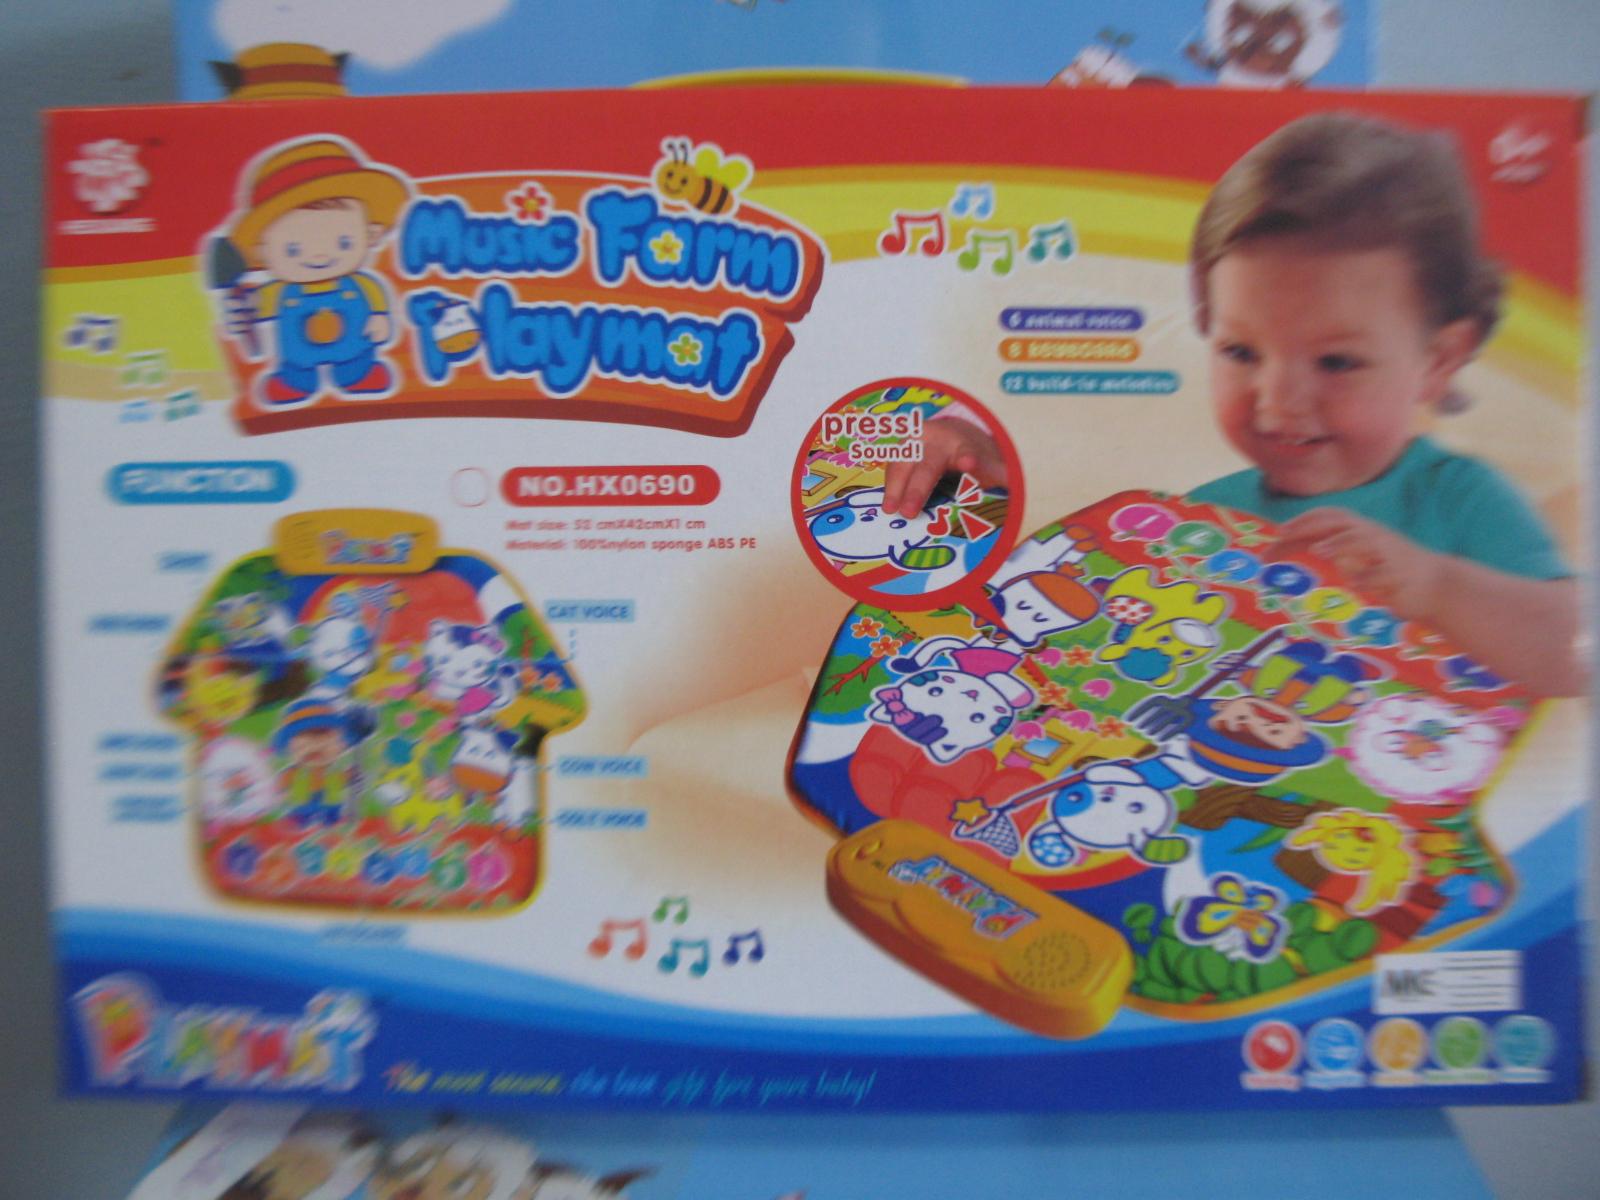 Kedai Nawwal Music Farm Playmat